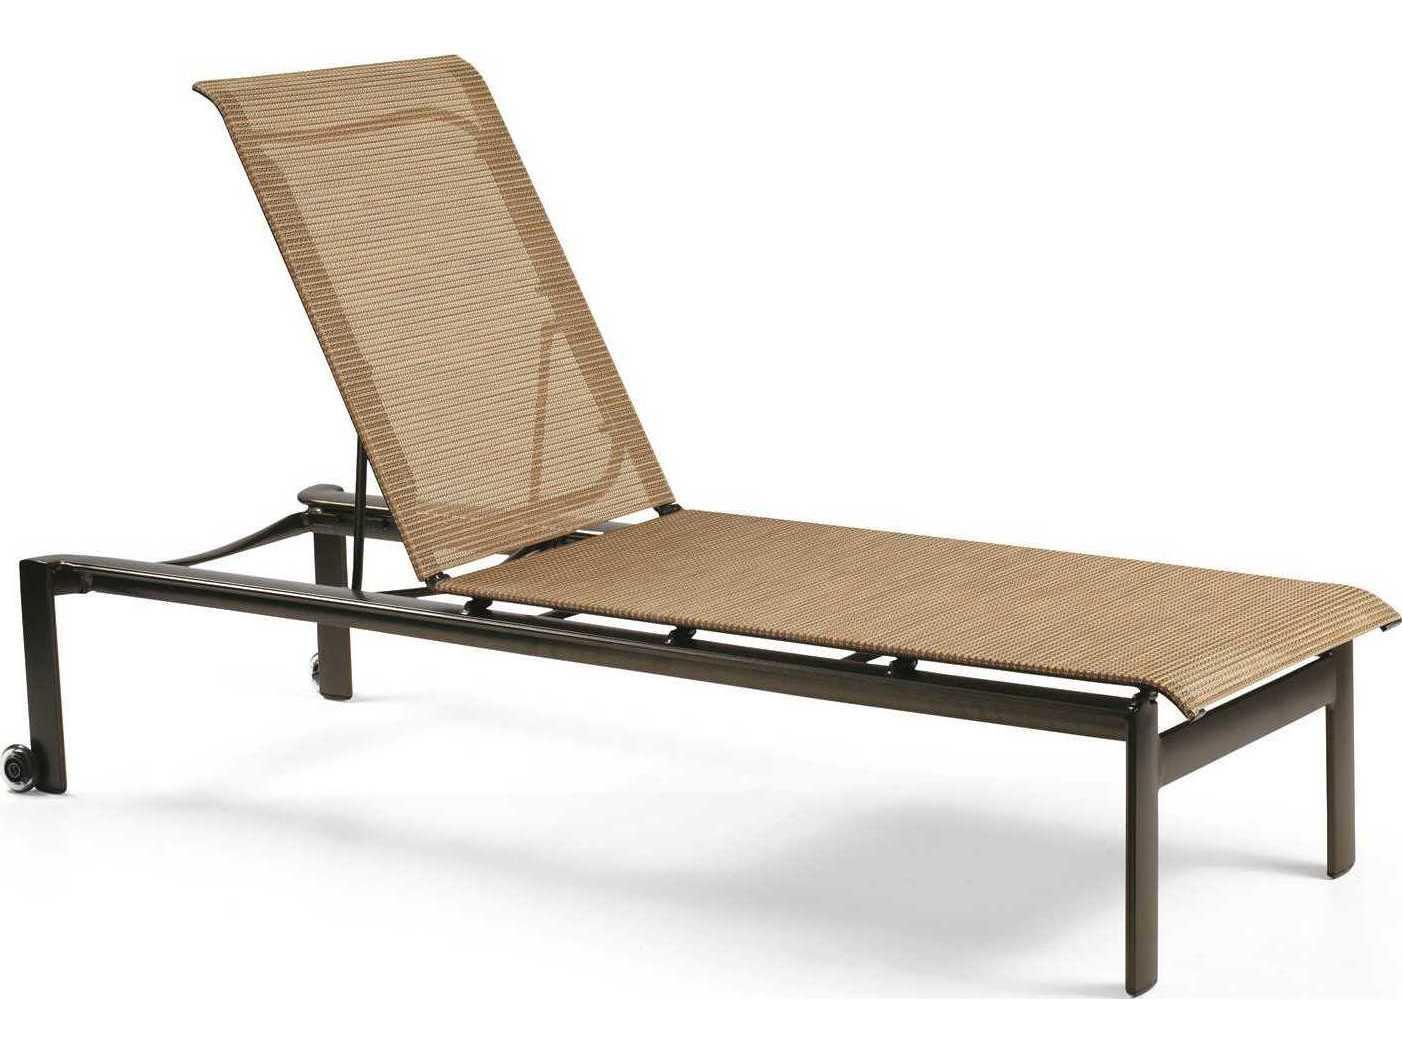 Winston belvedere sling aluminum stackable chaise lounge for Aluminum sling chaise lounge